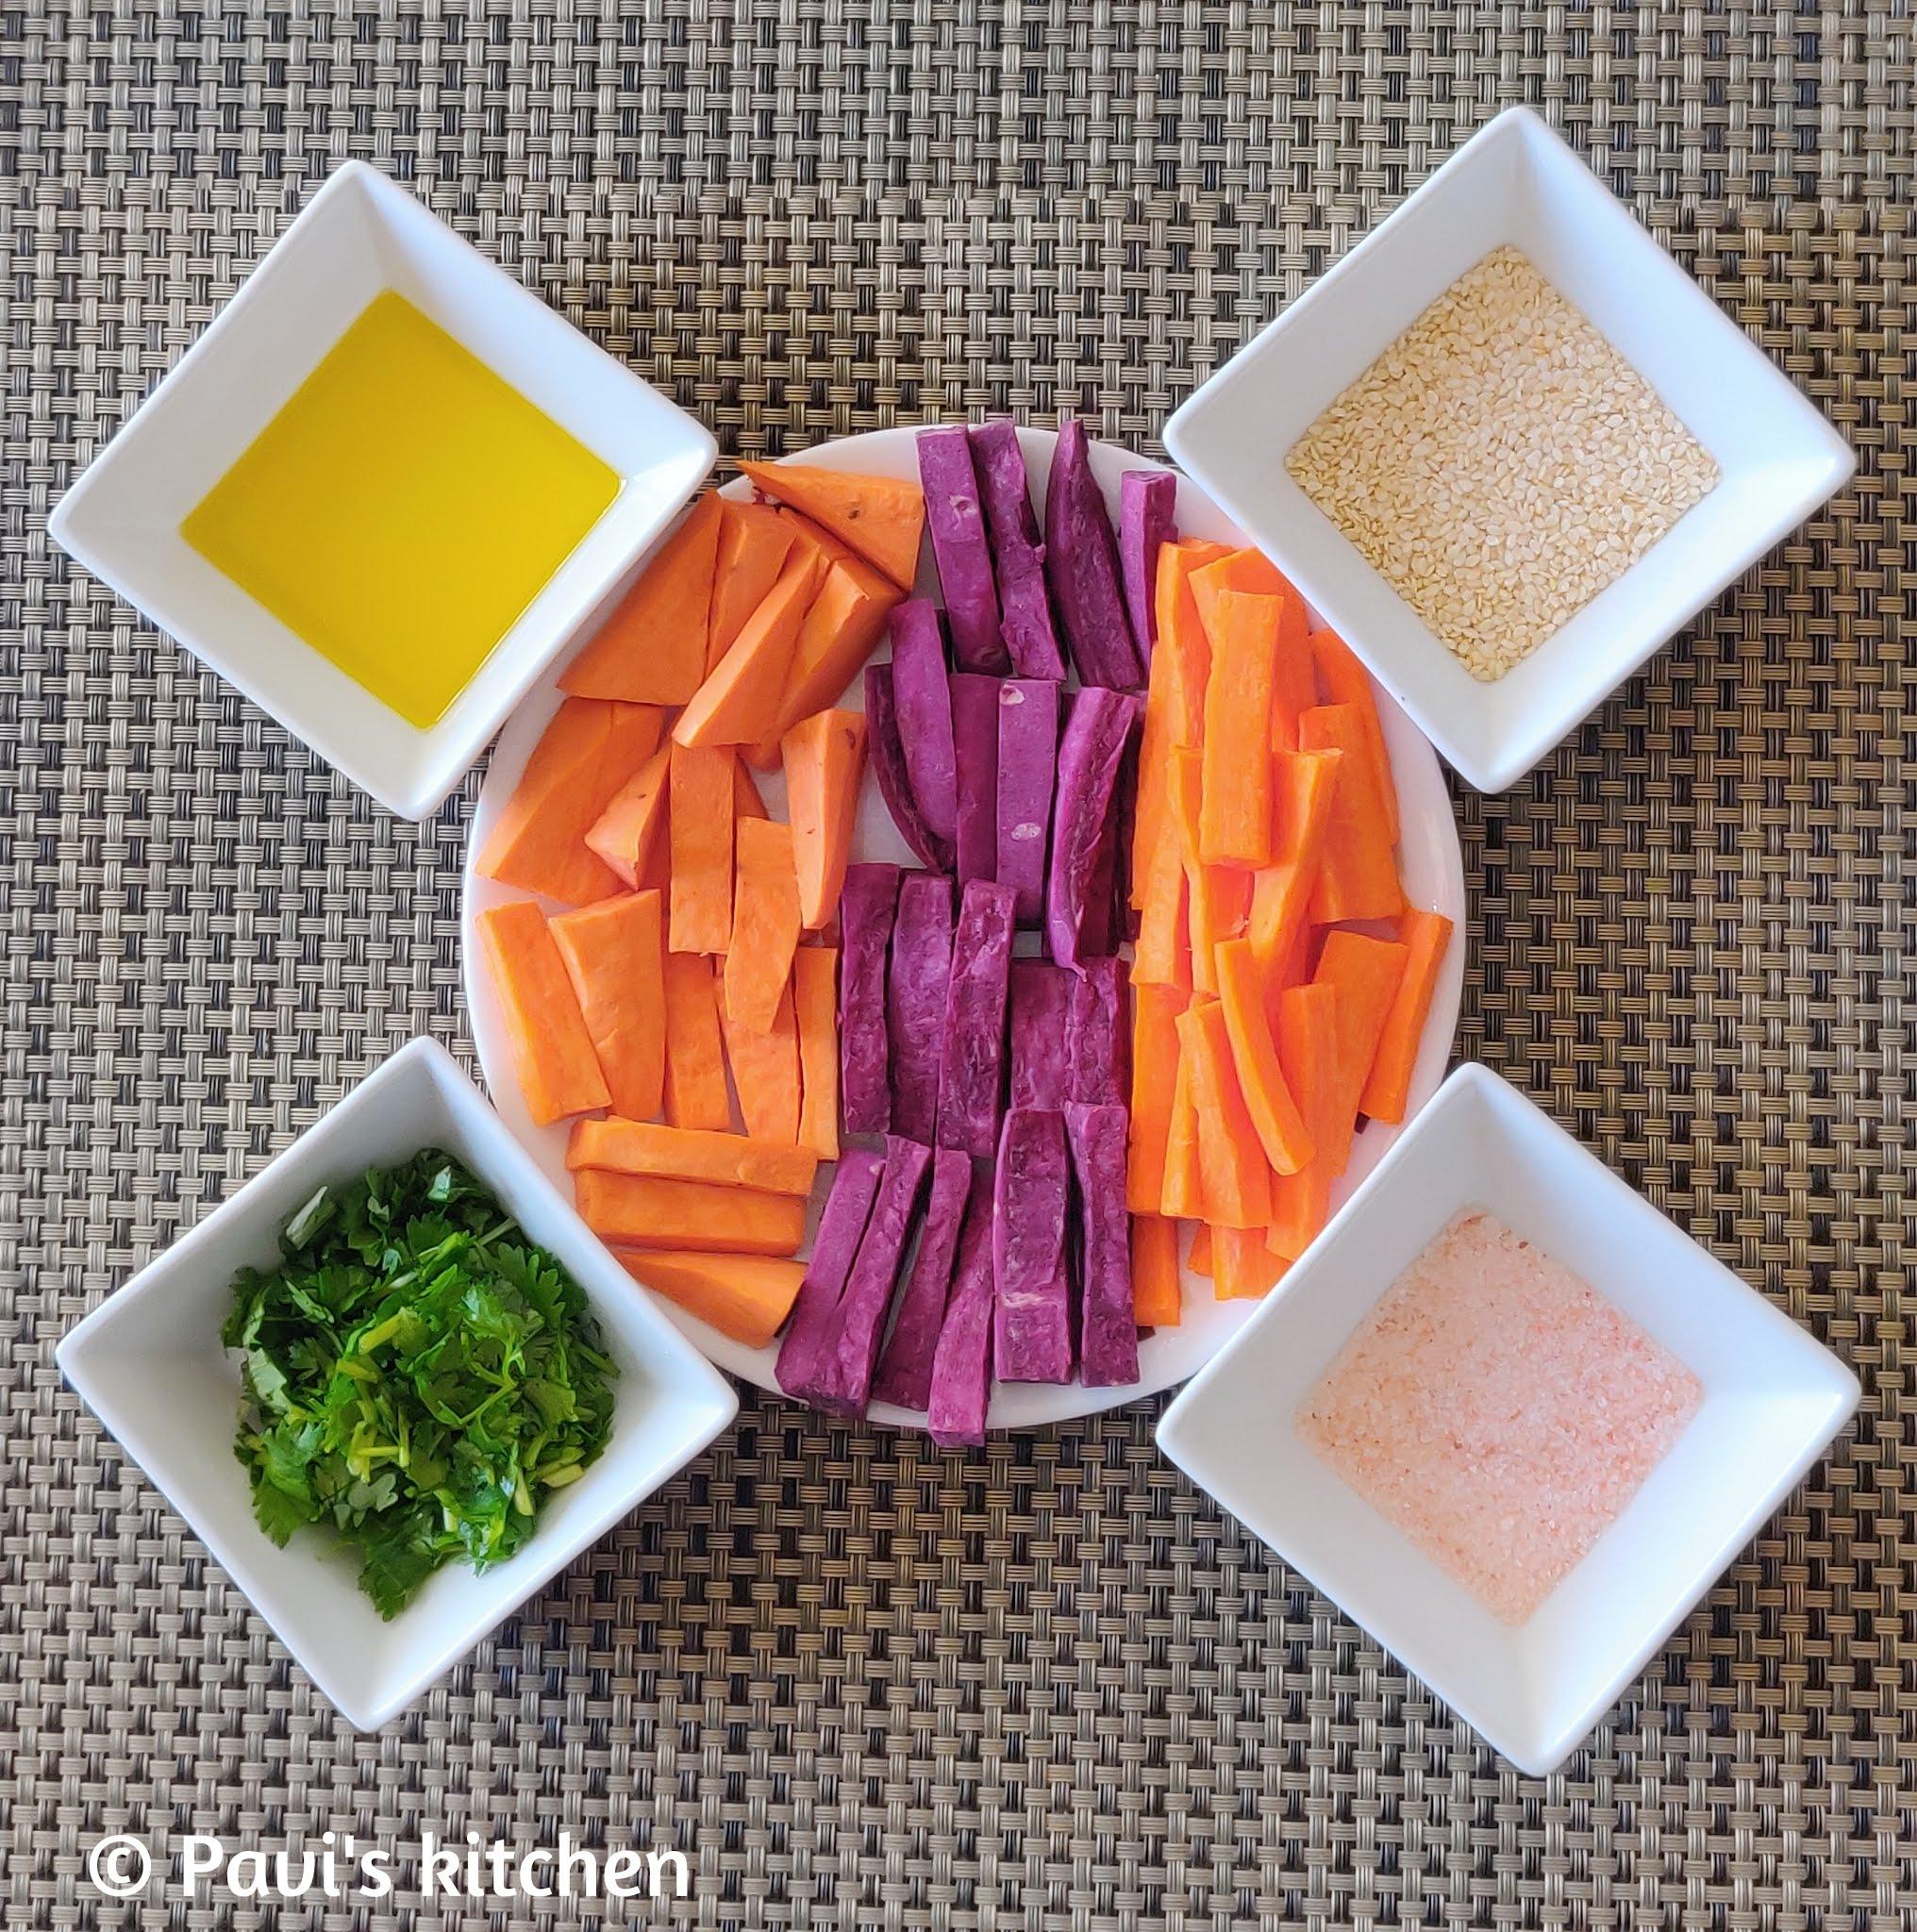 Sweet potato salad recipe | Indian sweet potato salad | grilled sweet potato salad